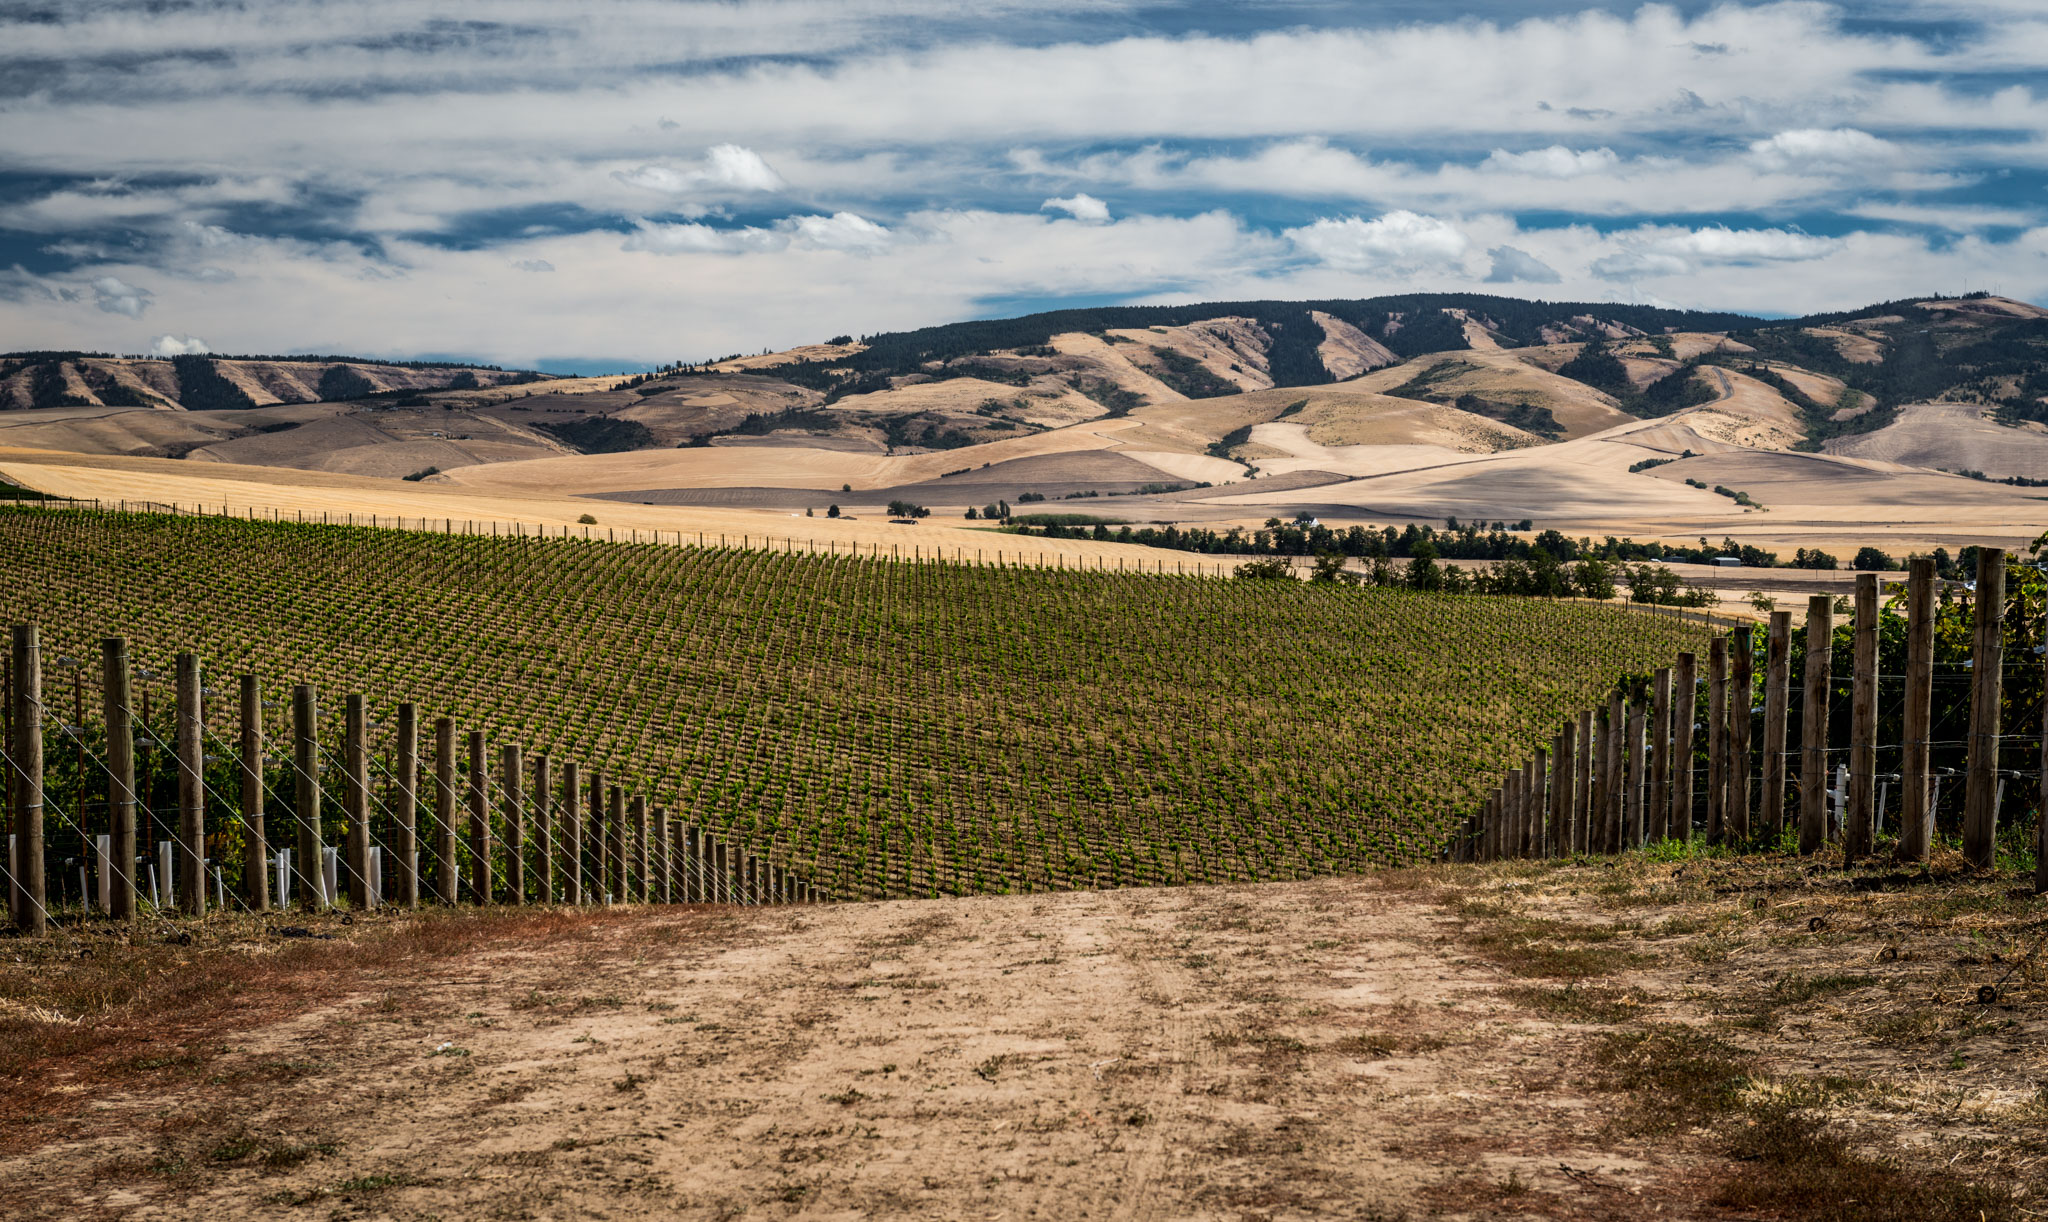 US : Washington : Blue Mountain Vineyard, Walla Walla